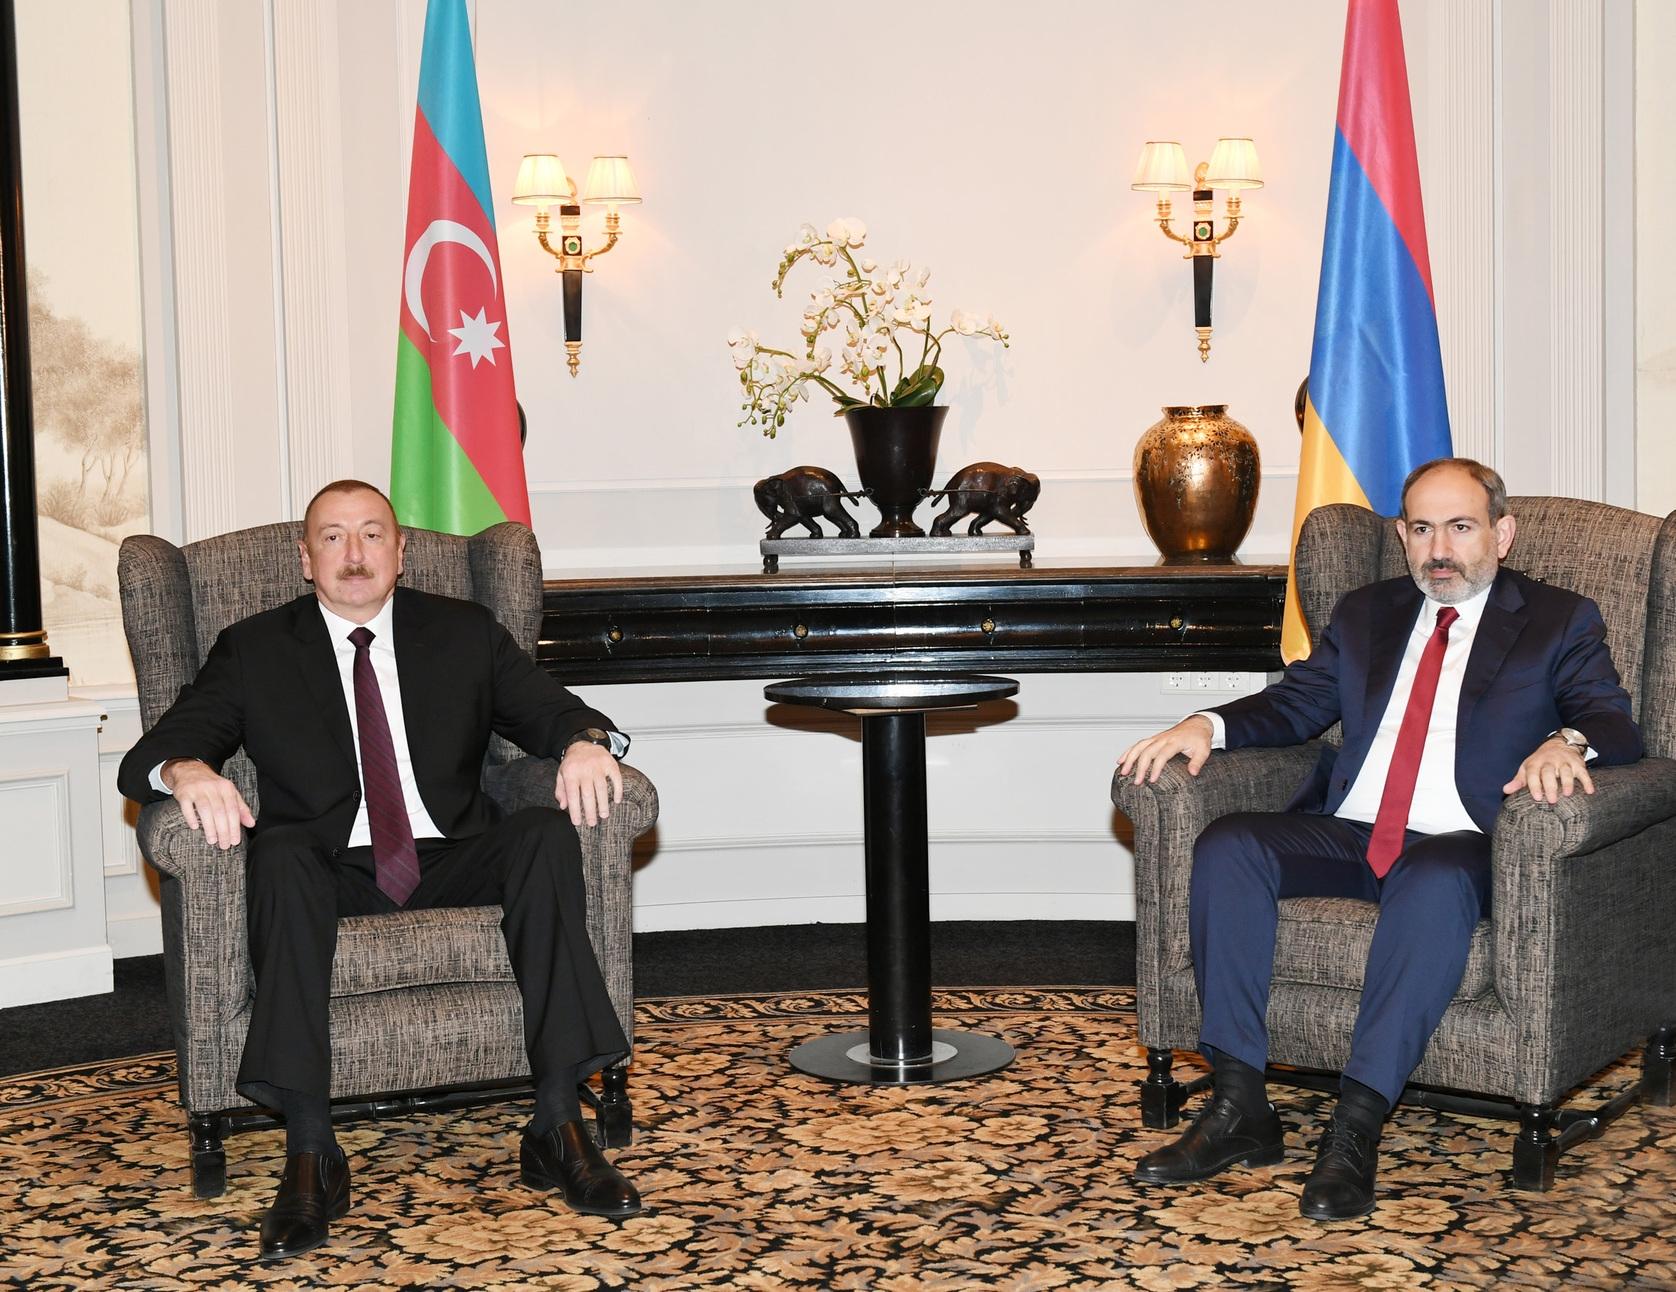 First formal Aliyev-Pashinyan meeting deemed a success | Eurasianet